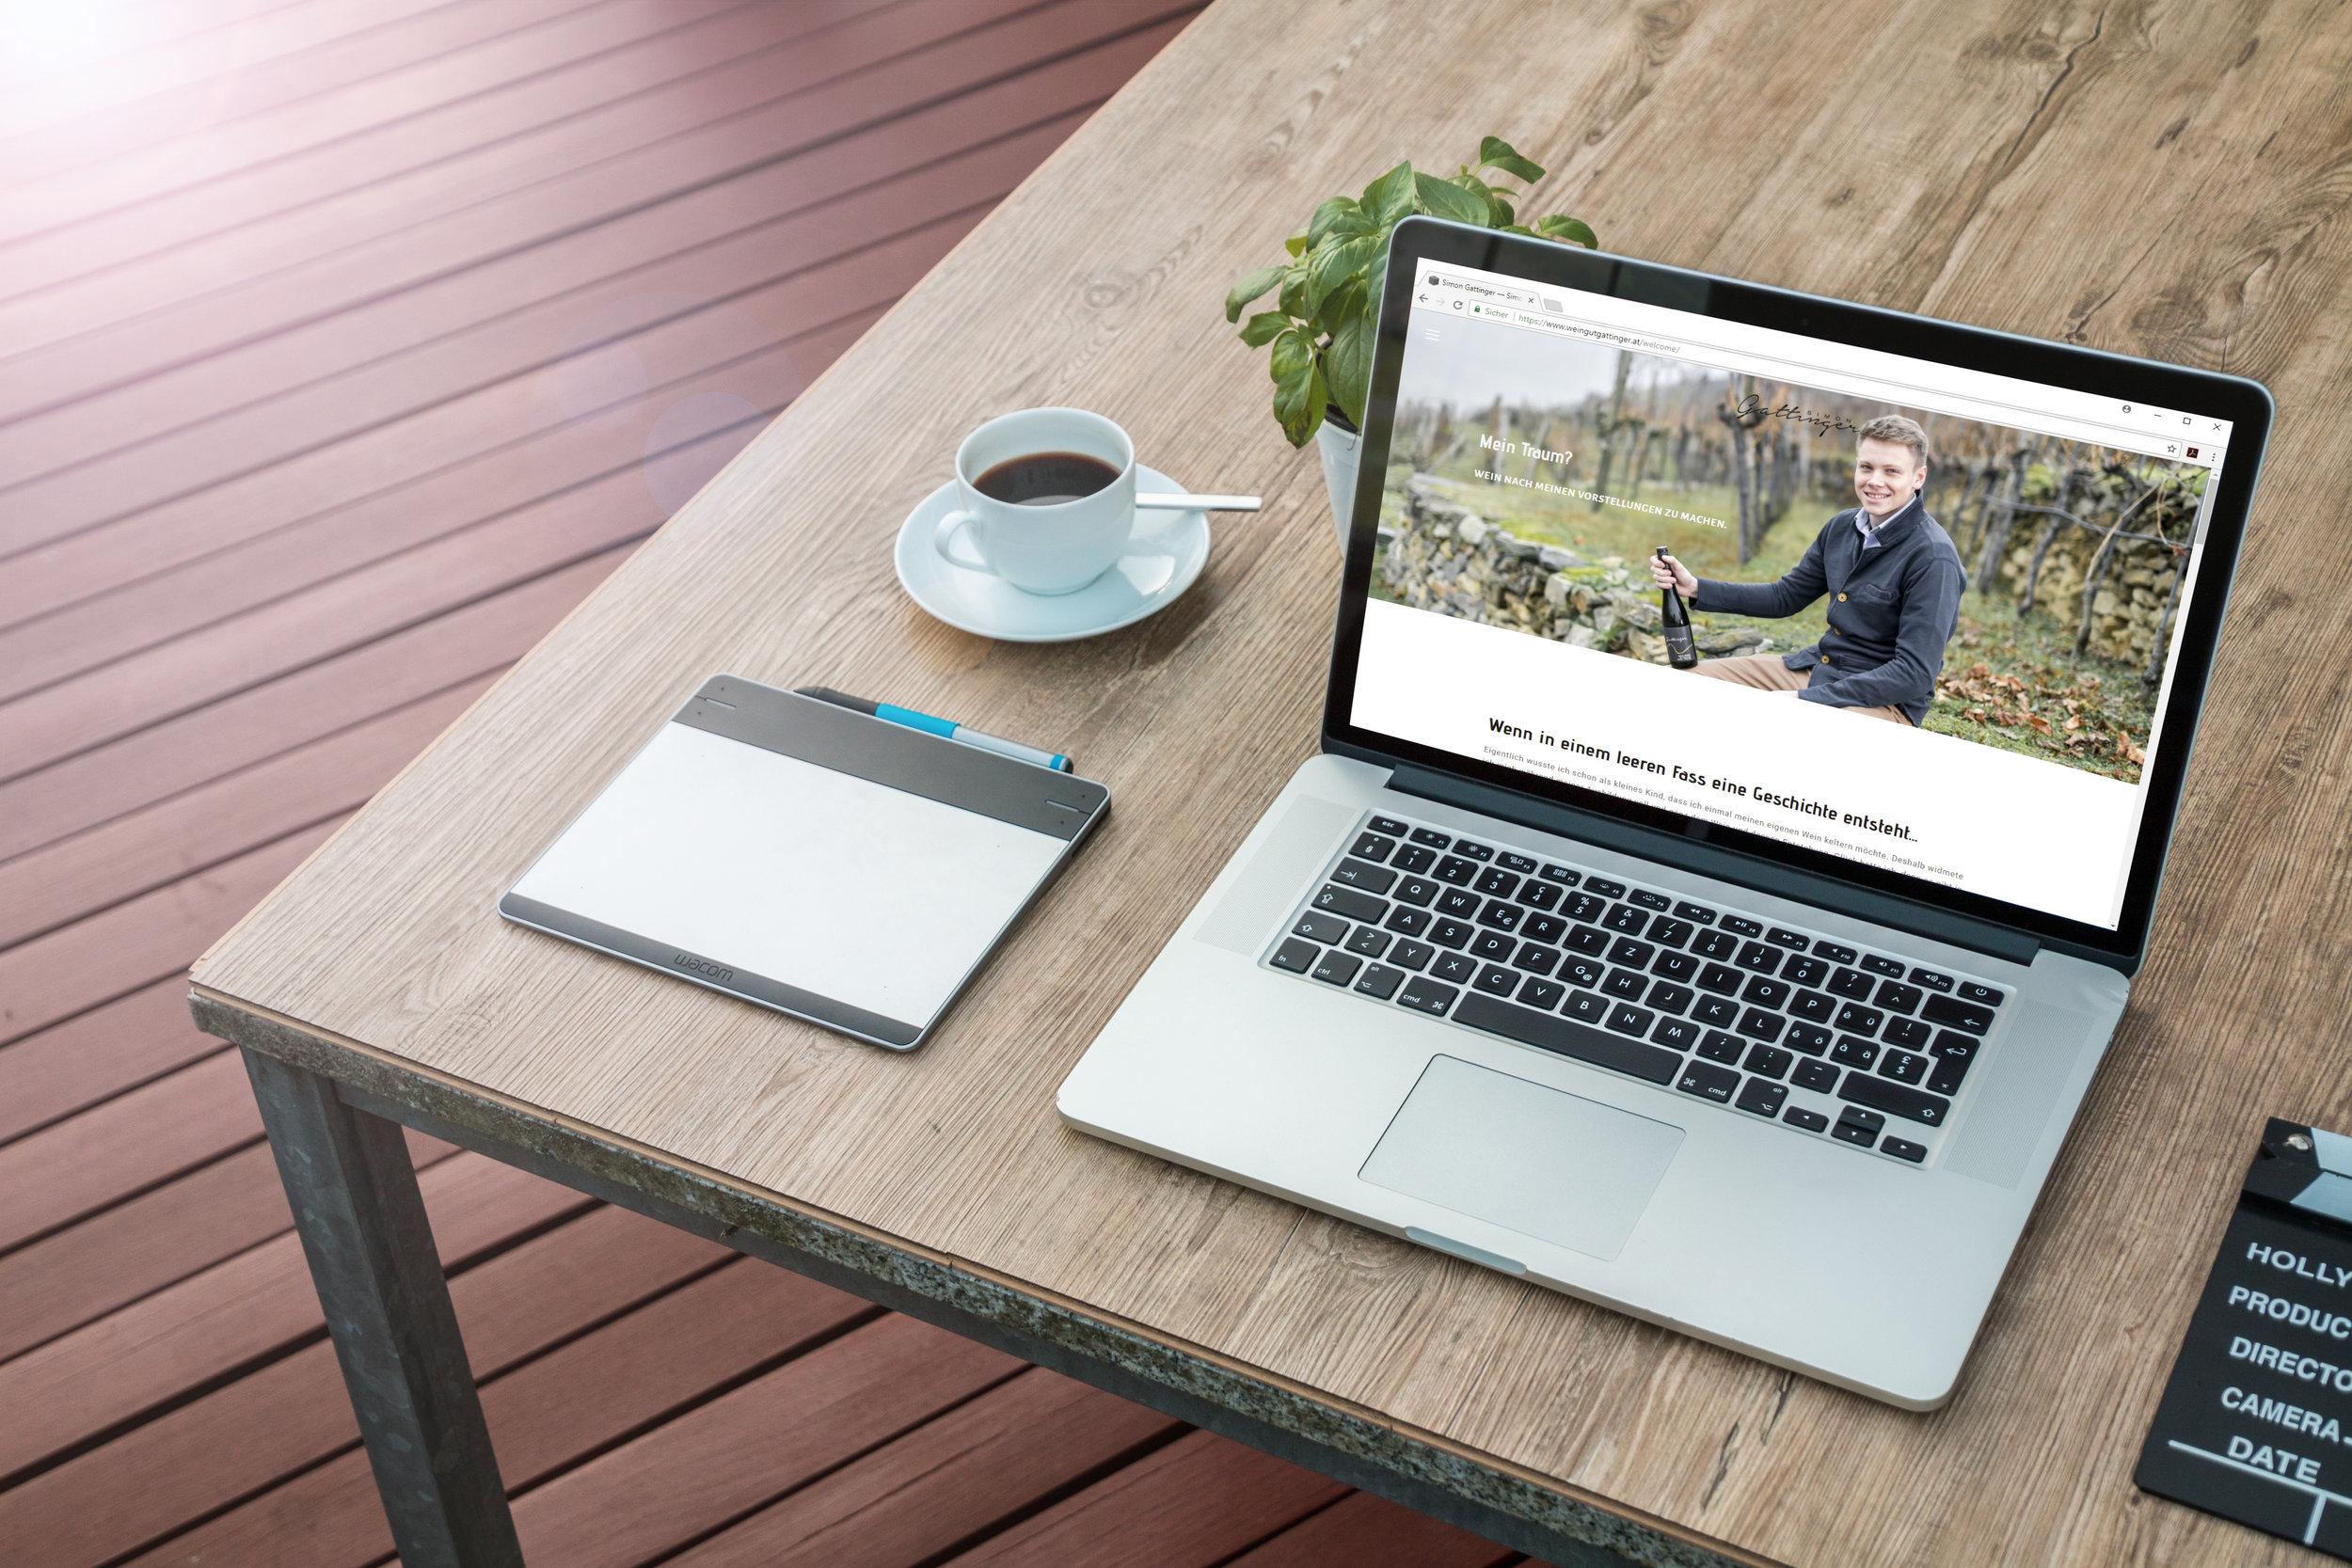 gattinger-Macbook Pro on Table Mockup Free PSD.jpg